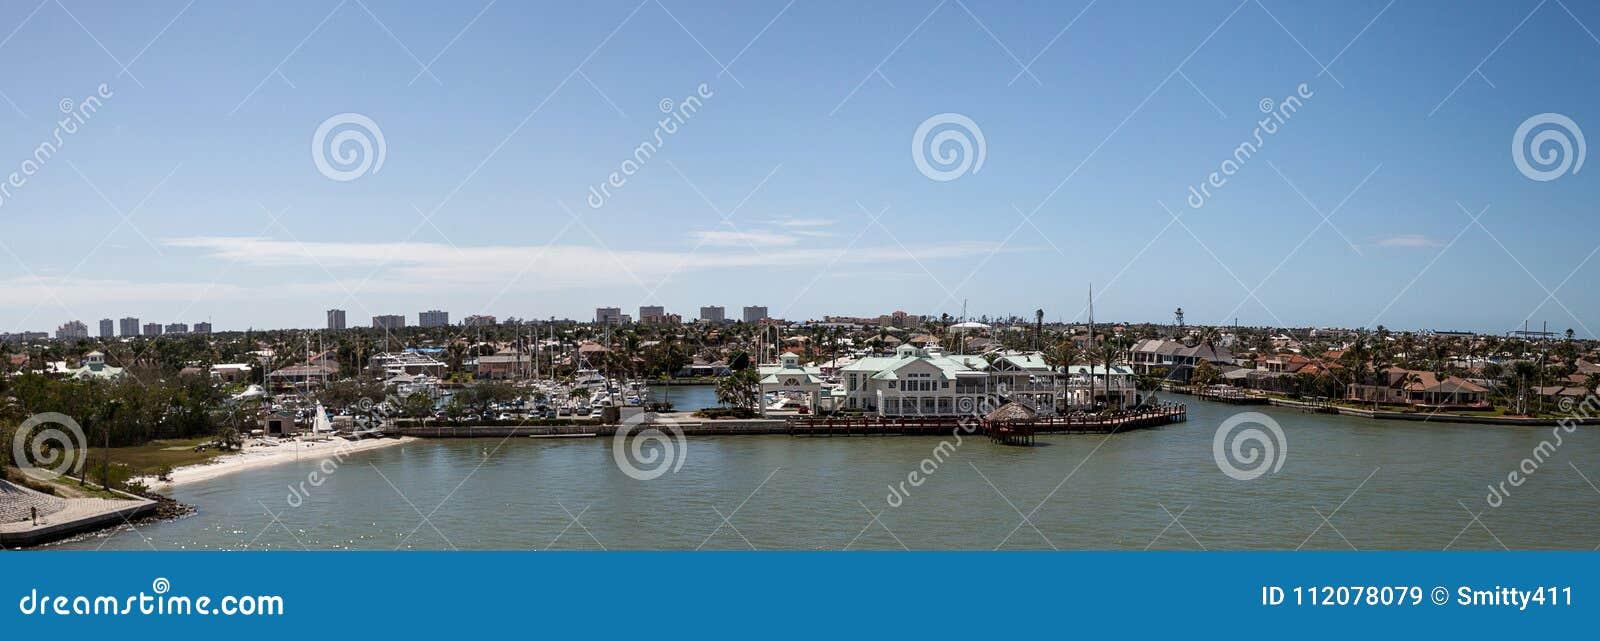 Panoramic view headed onto Marco Island, Florida